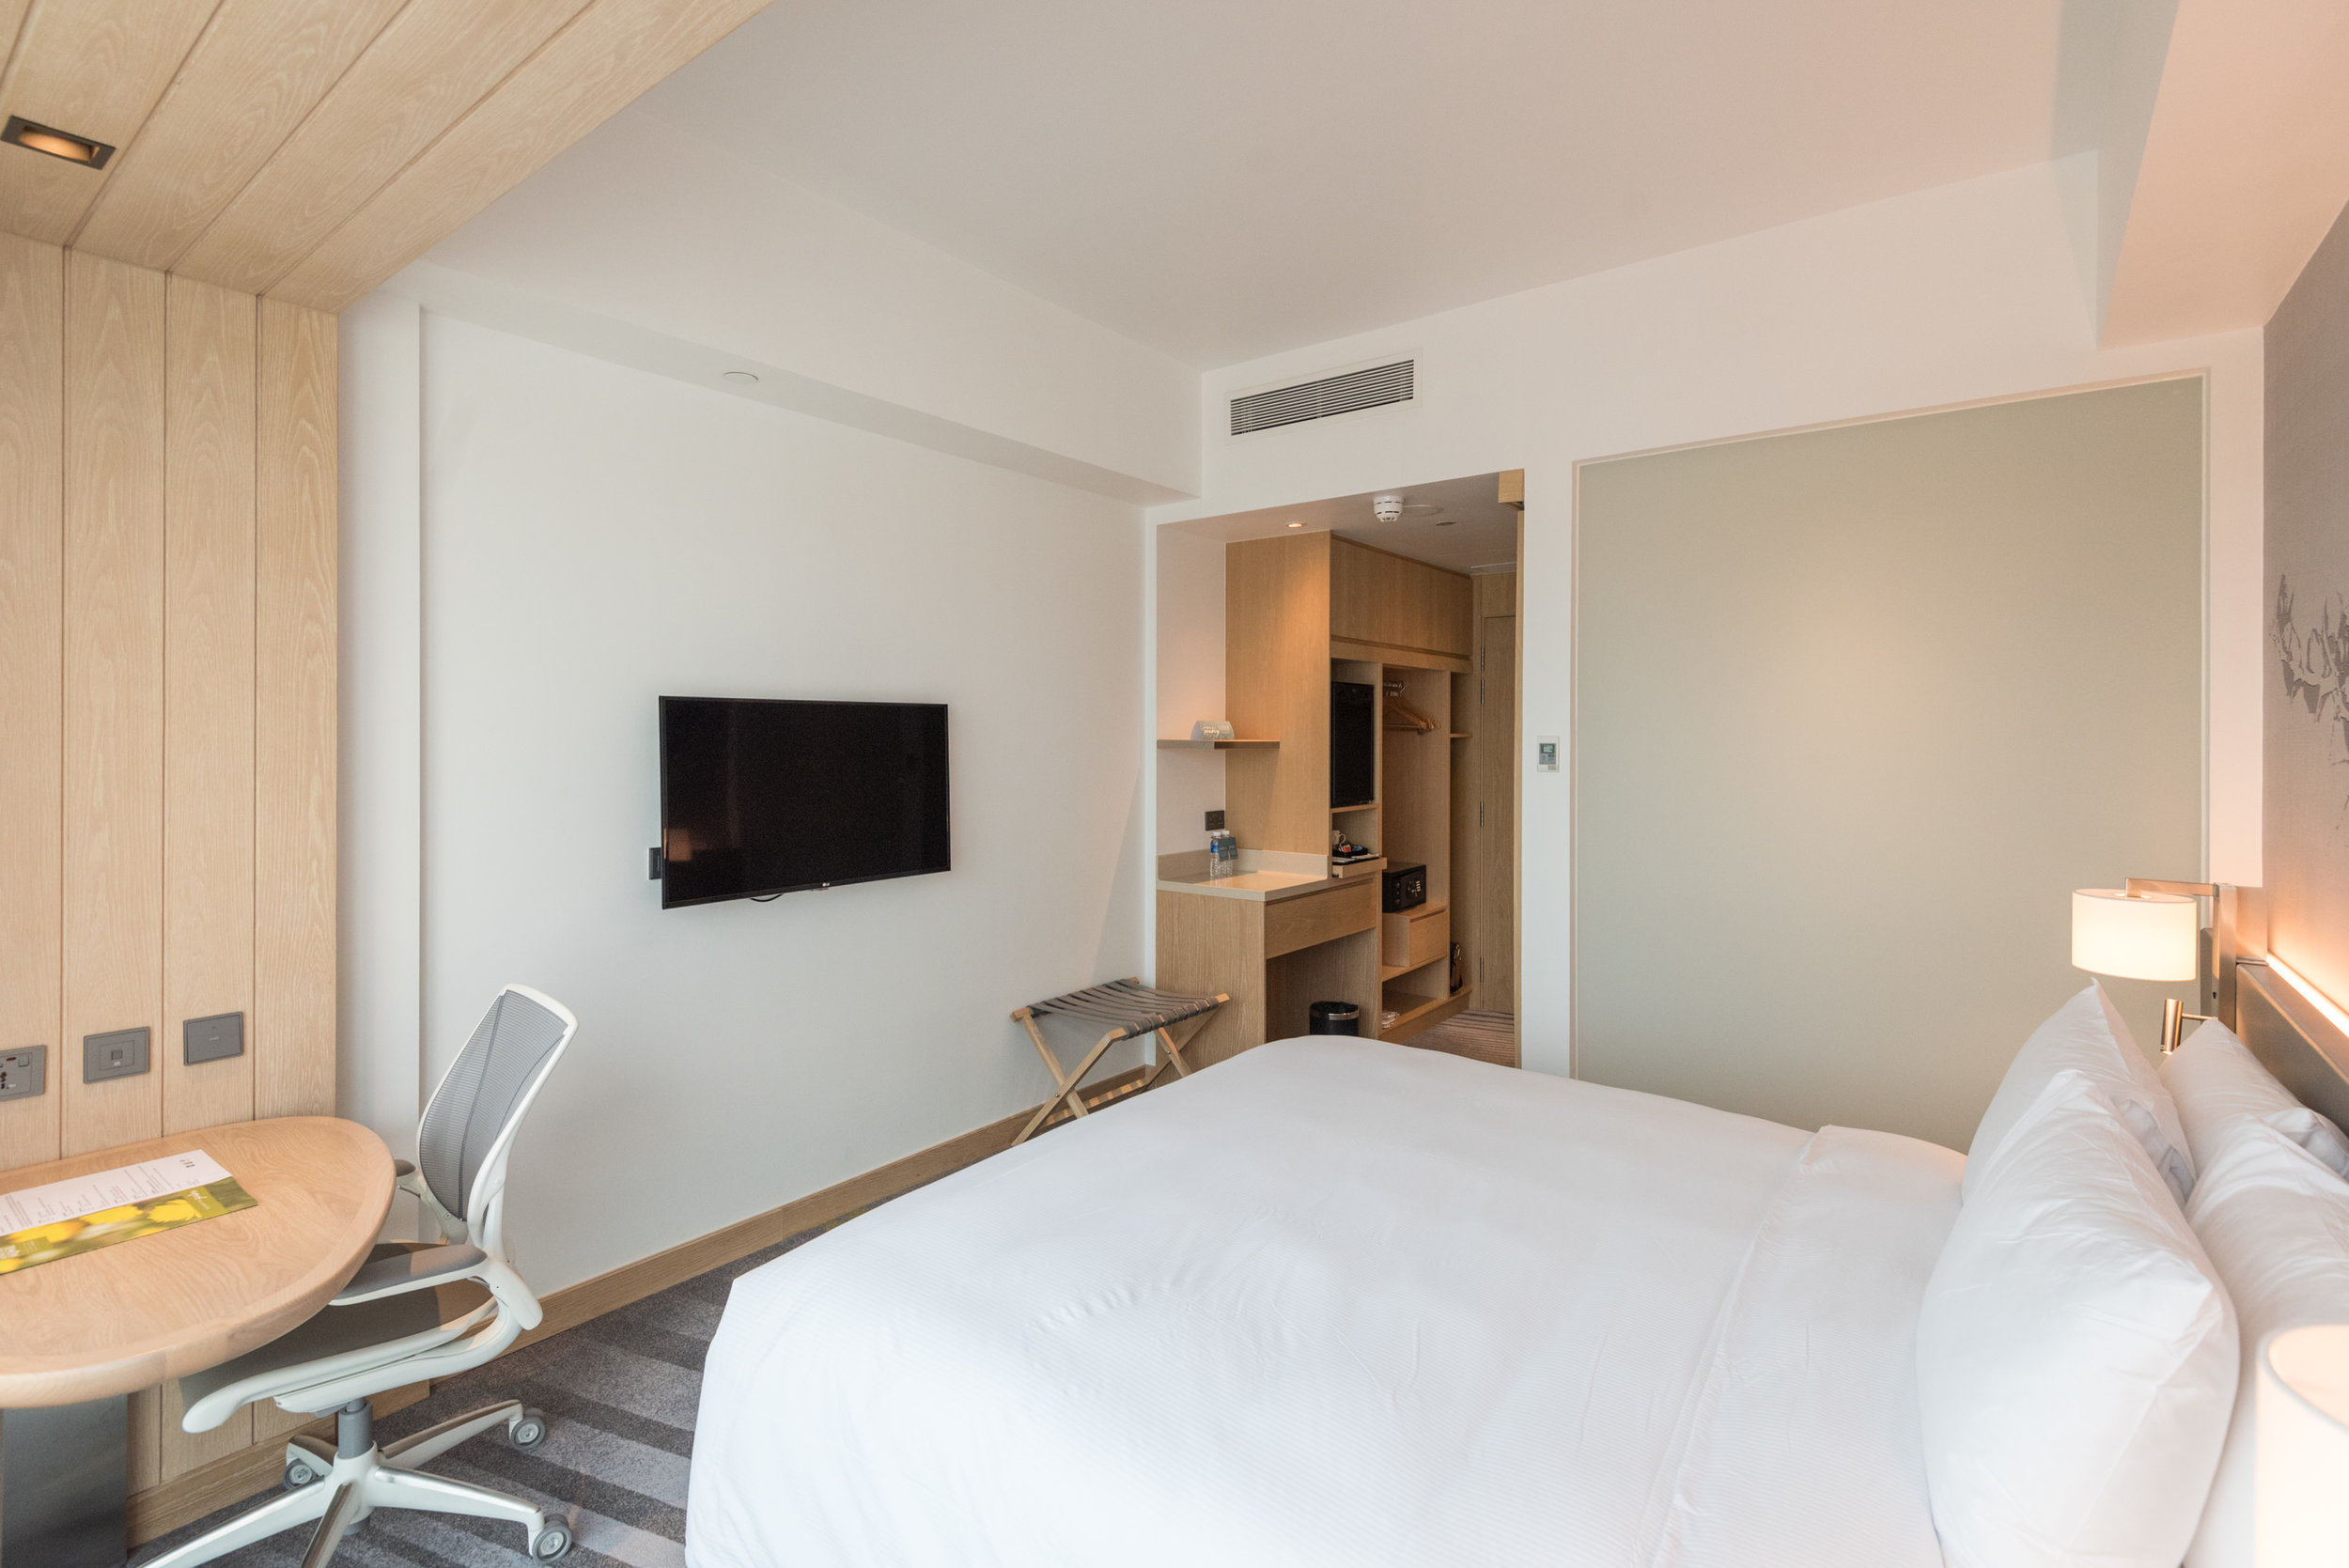 Bedroom  King Deluxe Room with Balcony - Hilton Garden Inn Singapore Serangoon